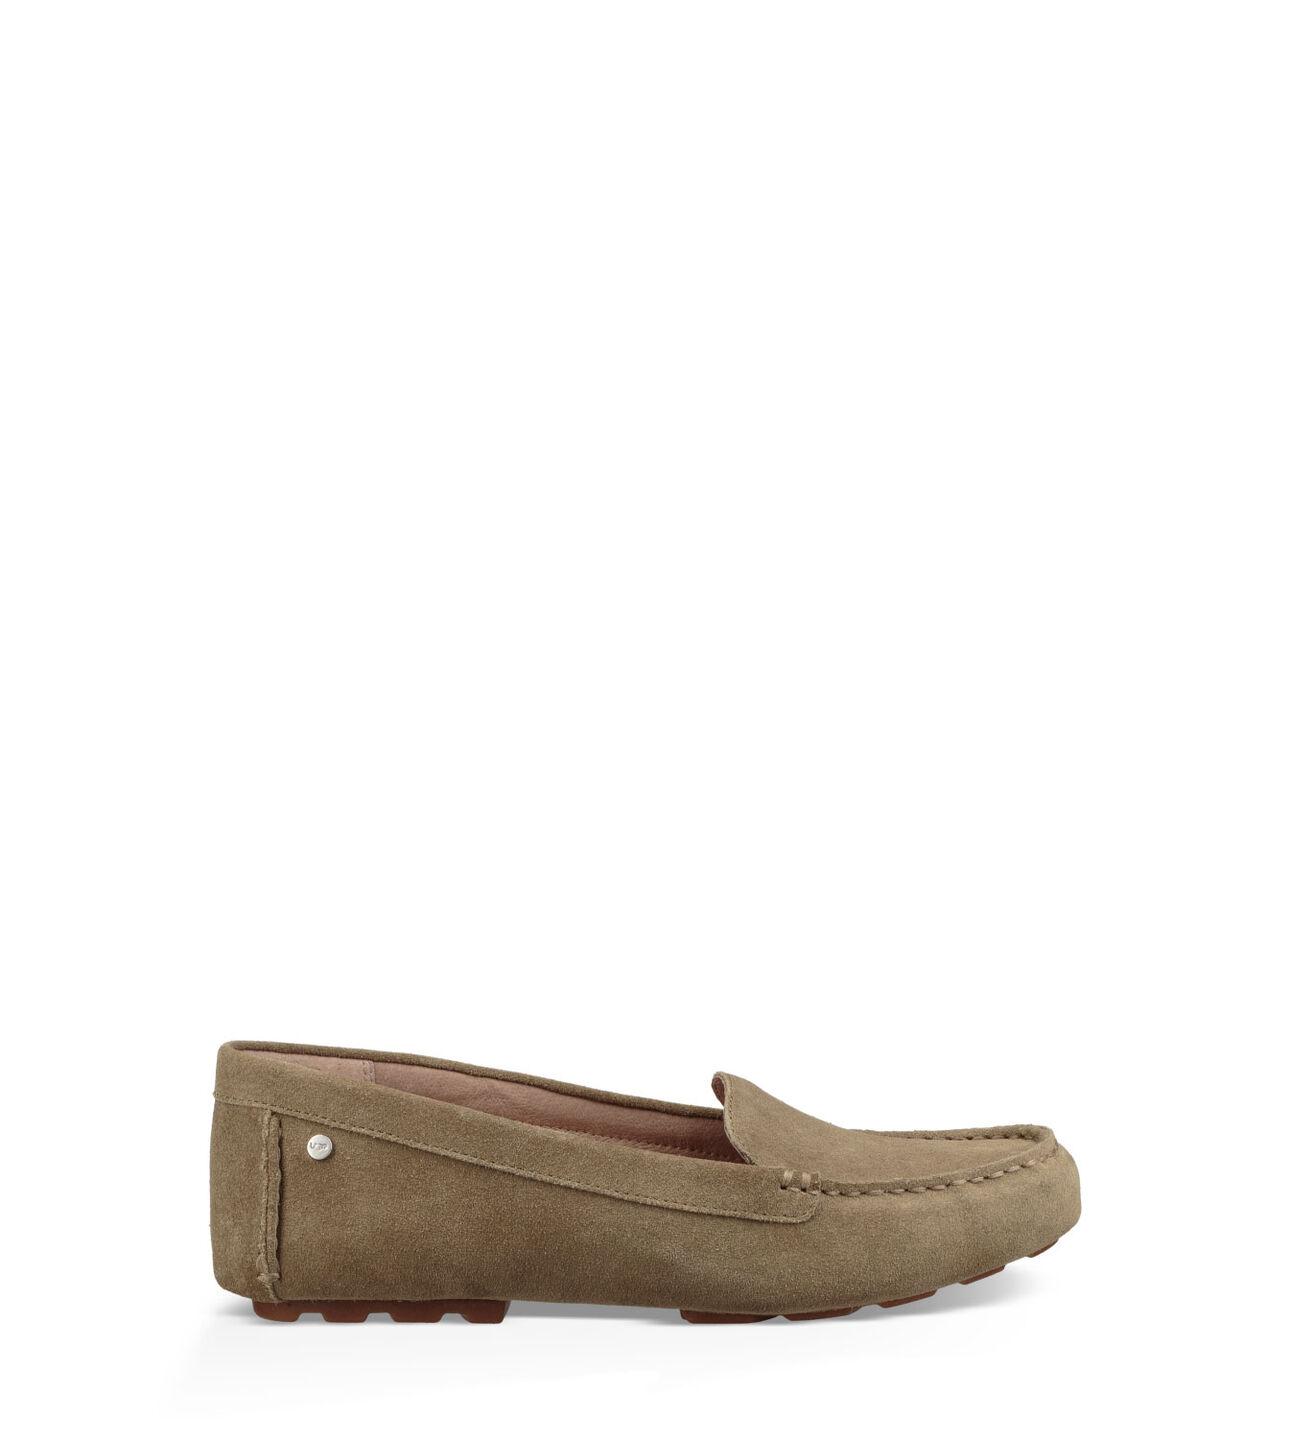 109f7e9d19e Ugg Womens Loafers